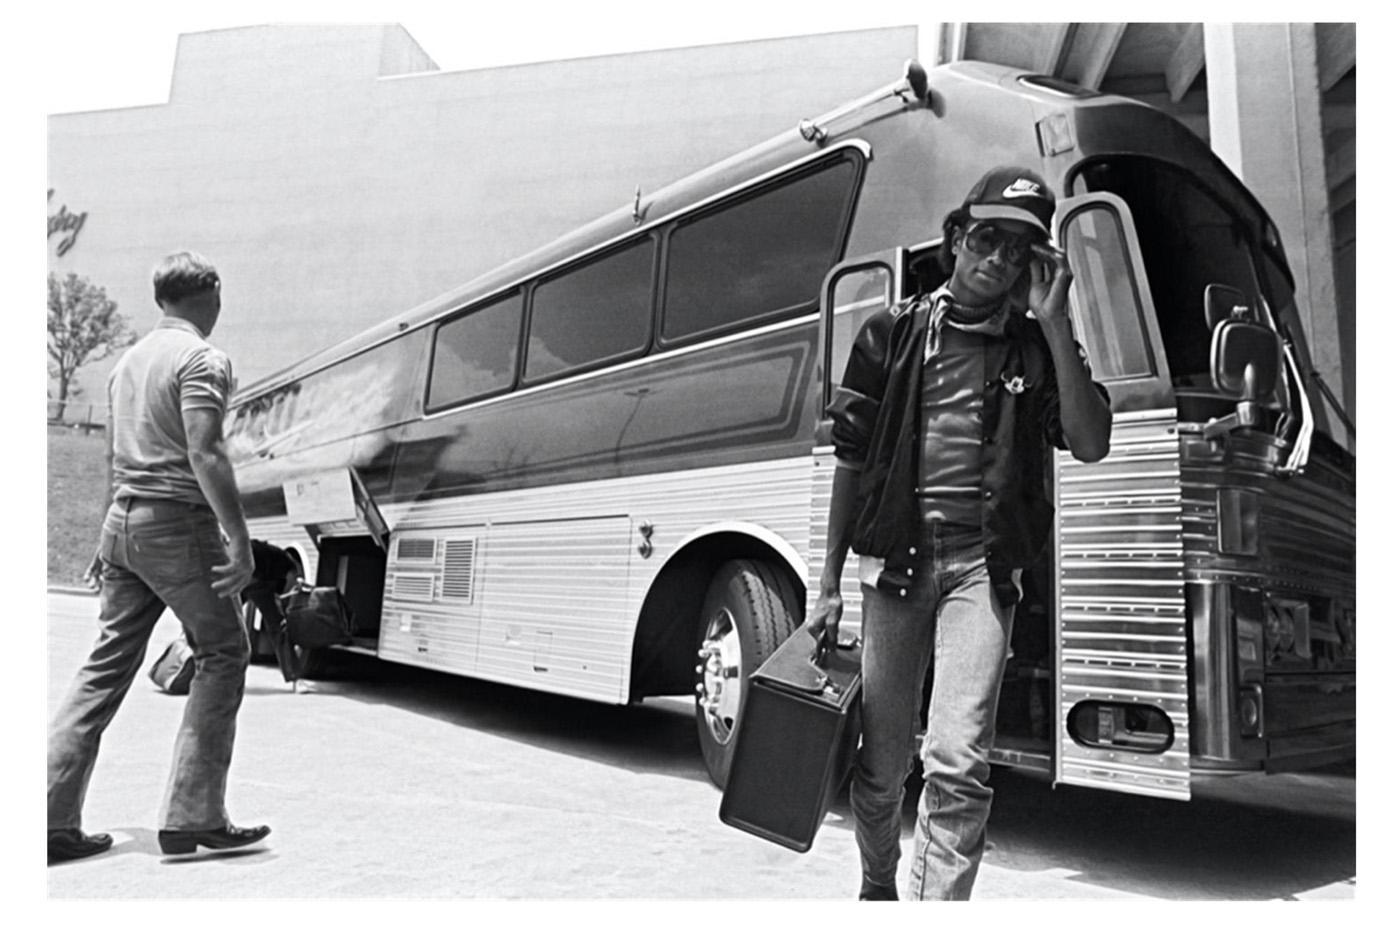 Michael Jackson in 1981 on the 'Triumph' tour